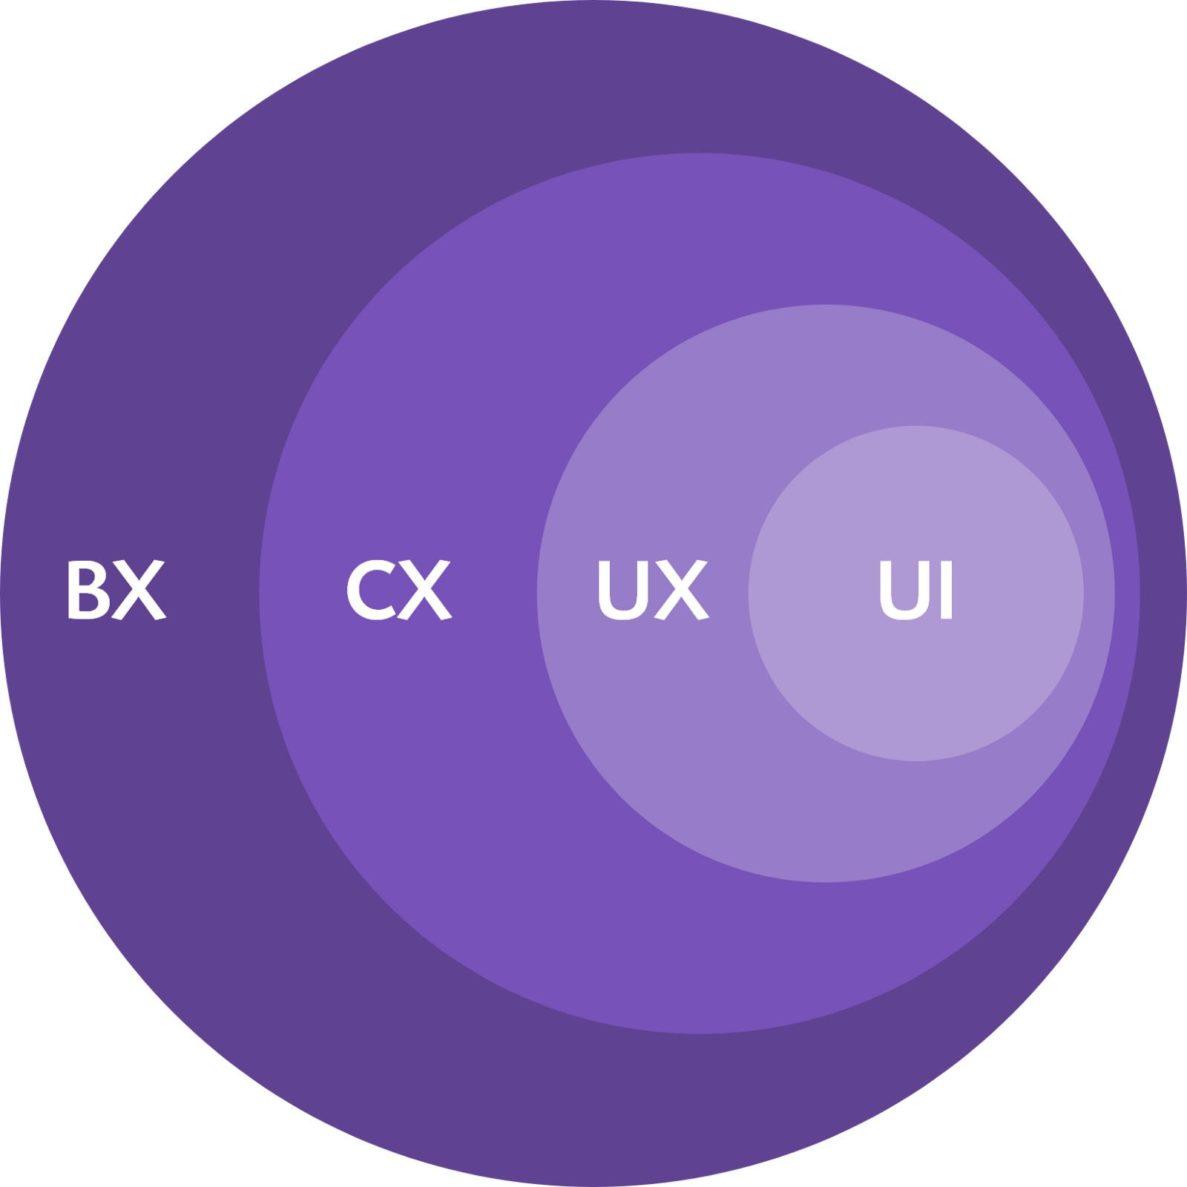 UI UX CX BX